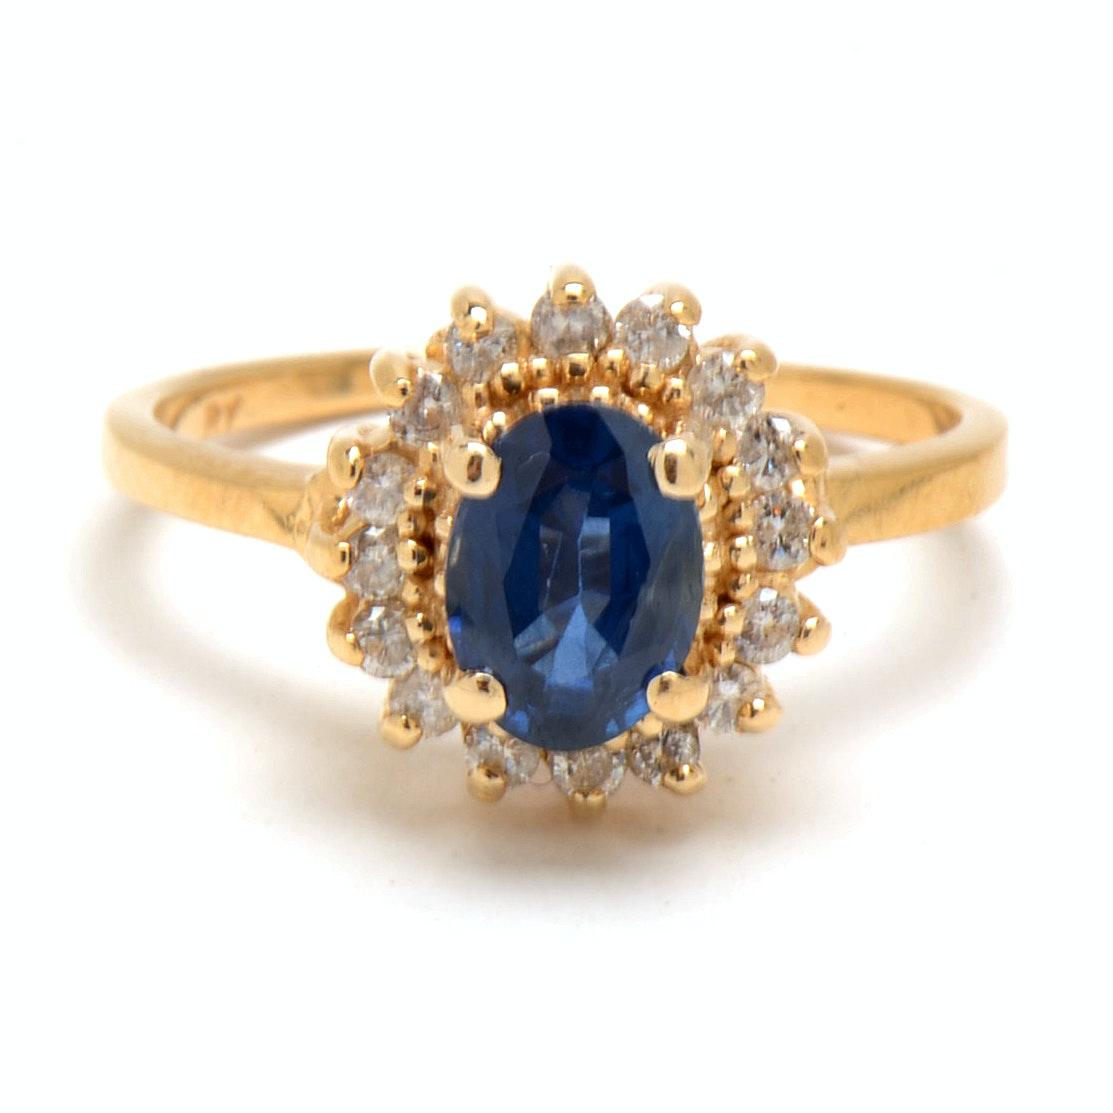 14K Yellow Gold 1.06 Carat Natural Blue Sapphire Diamond Ring